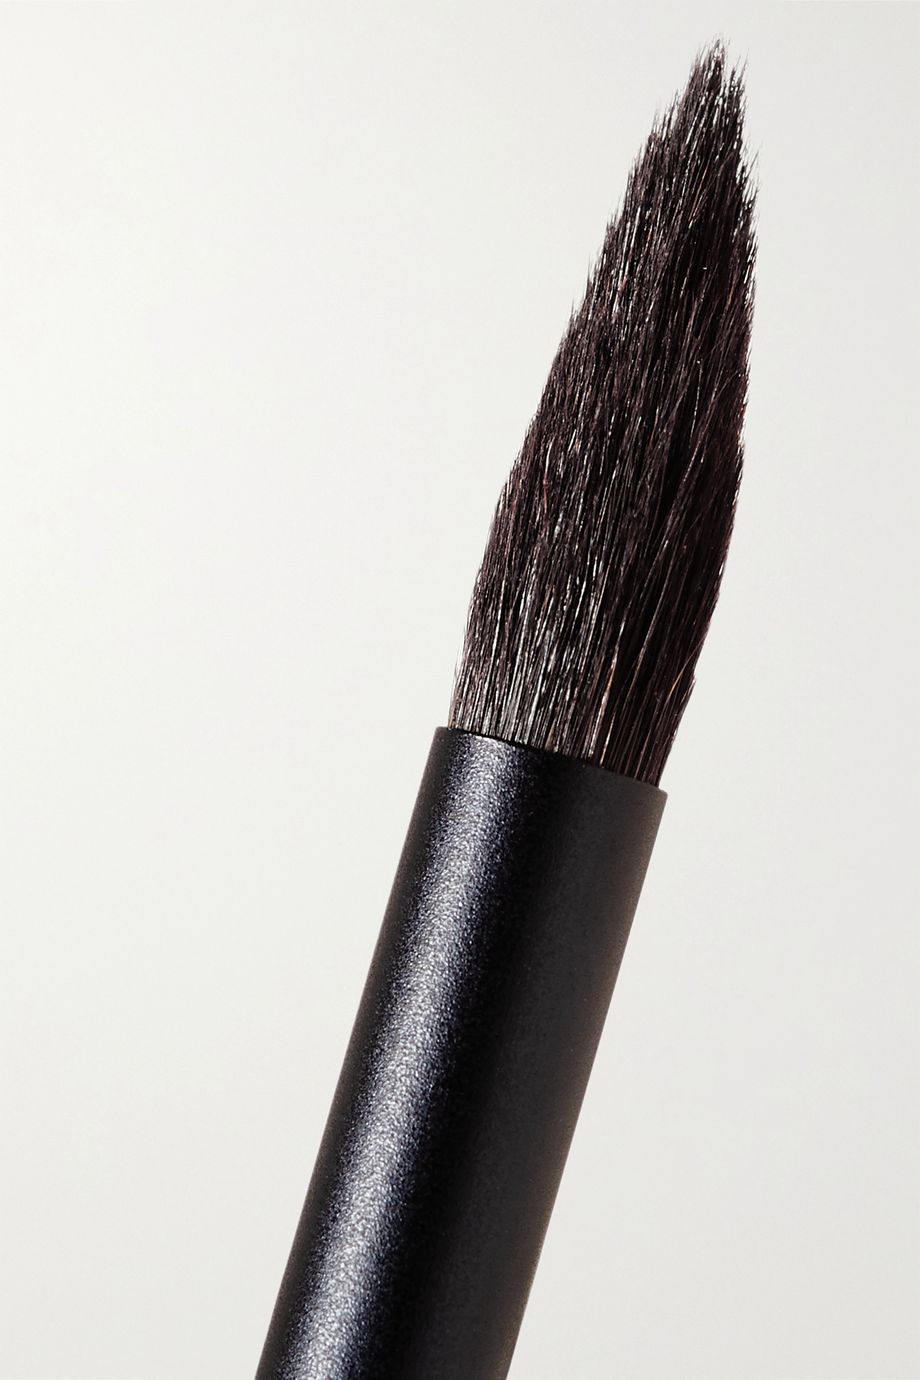 Surratt Beauty Artistique Smokey Eye Brush Petite